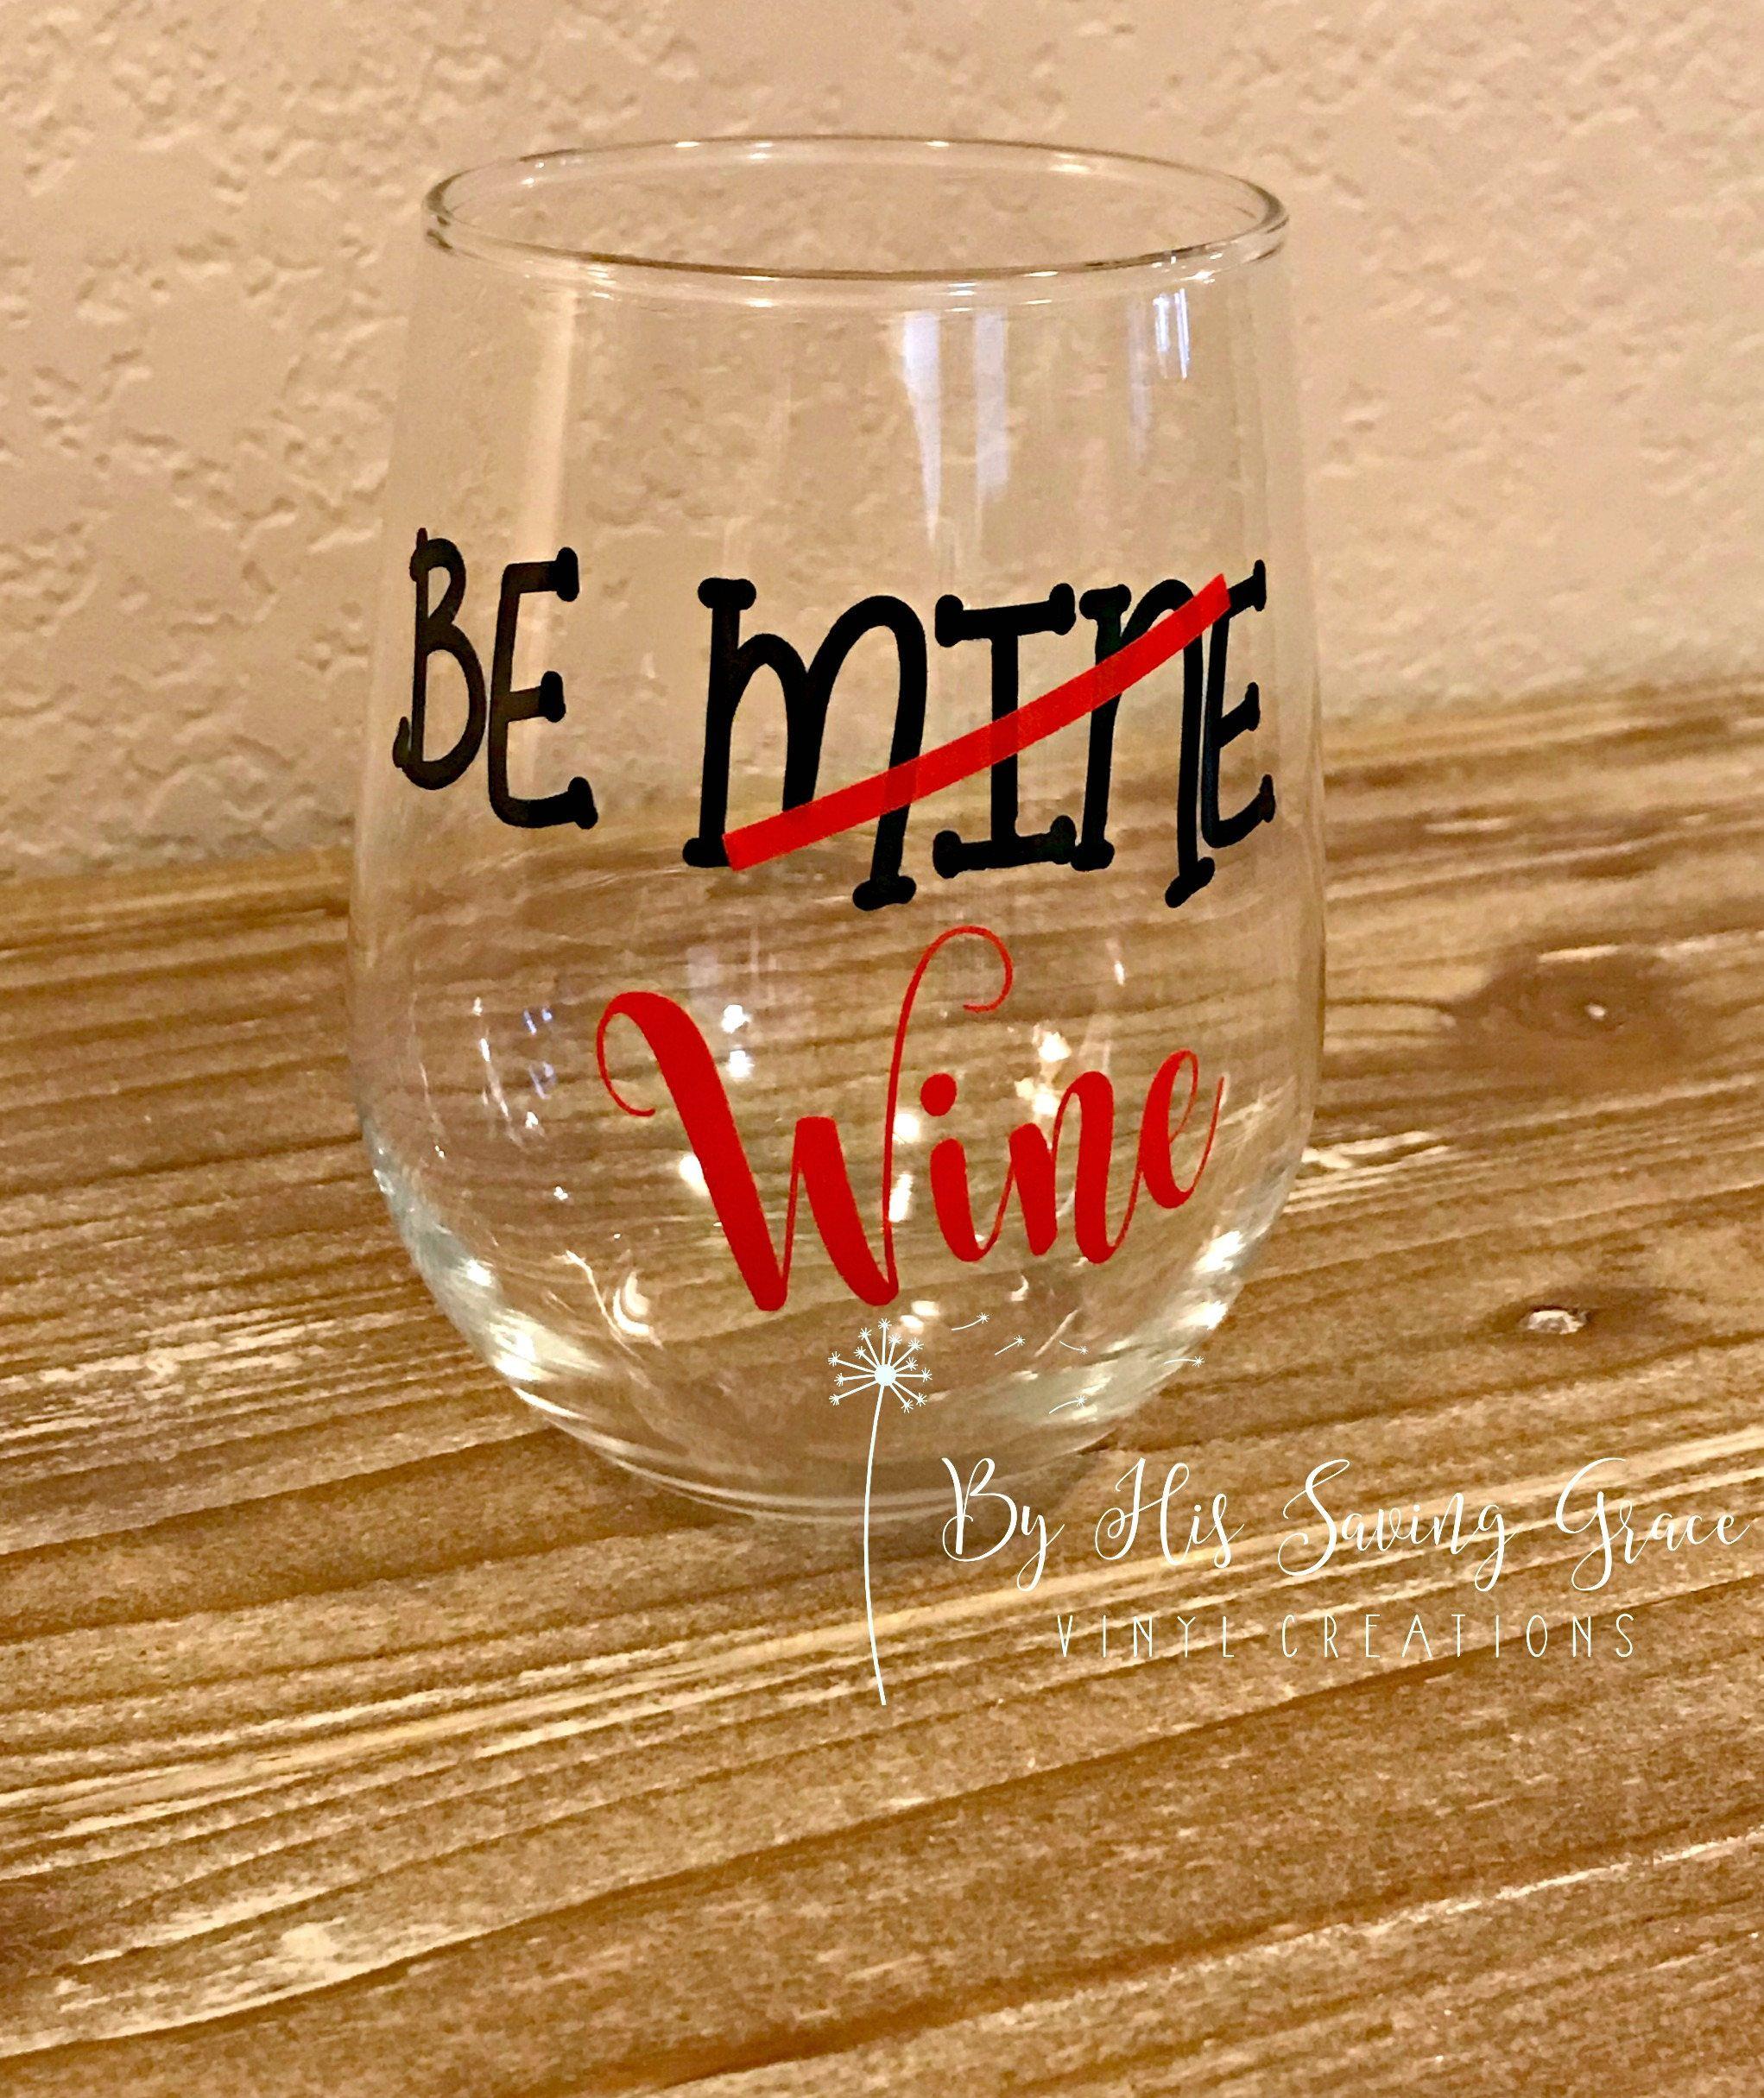 Be mine wine stemless wine glass valentines day gift